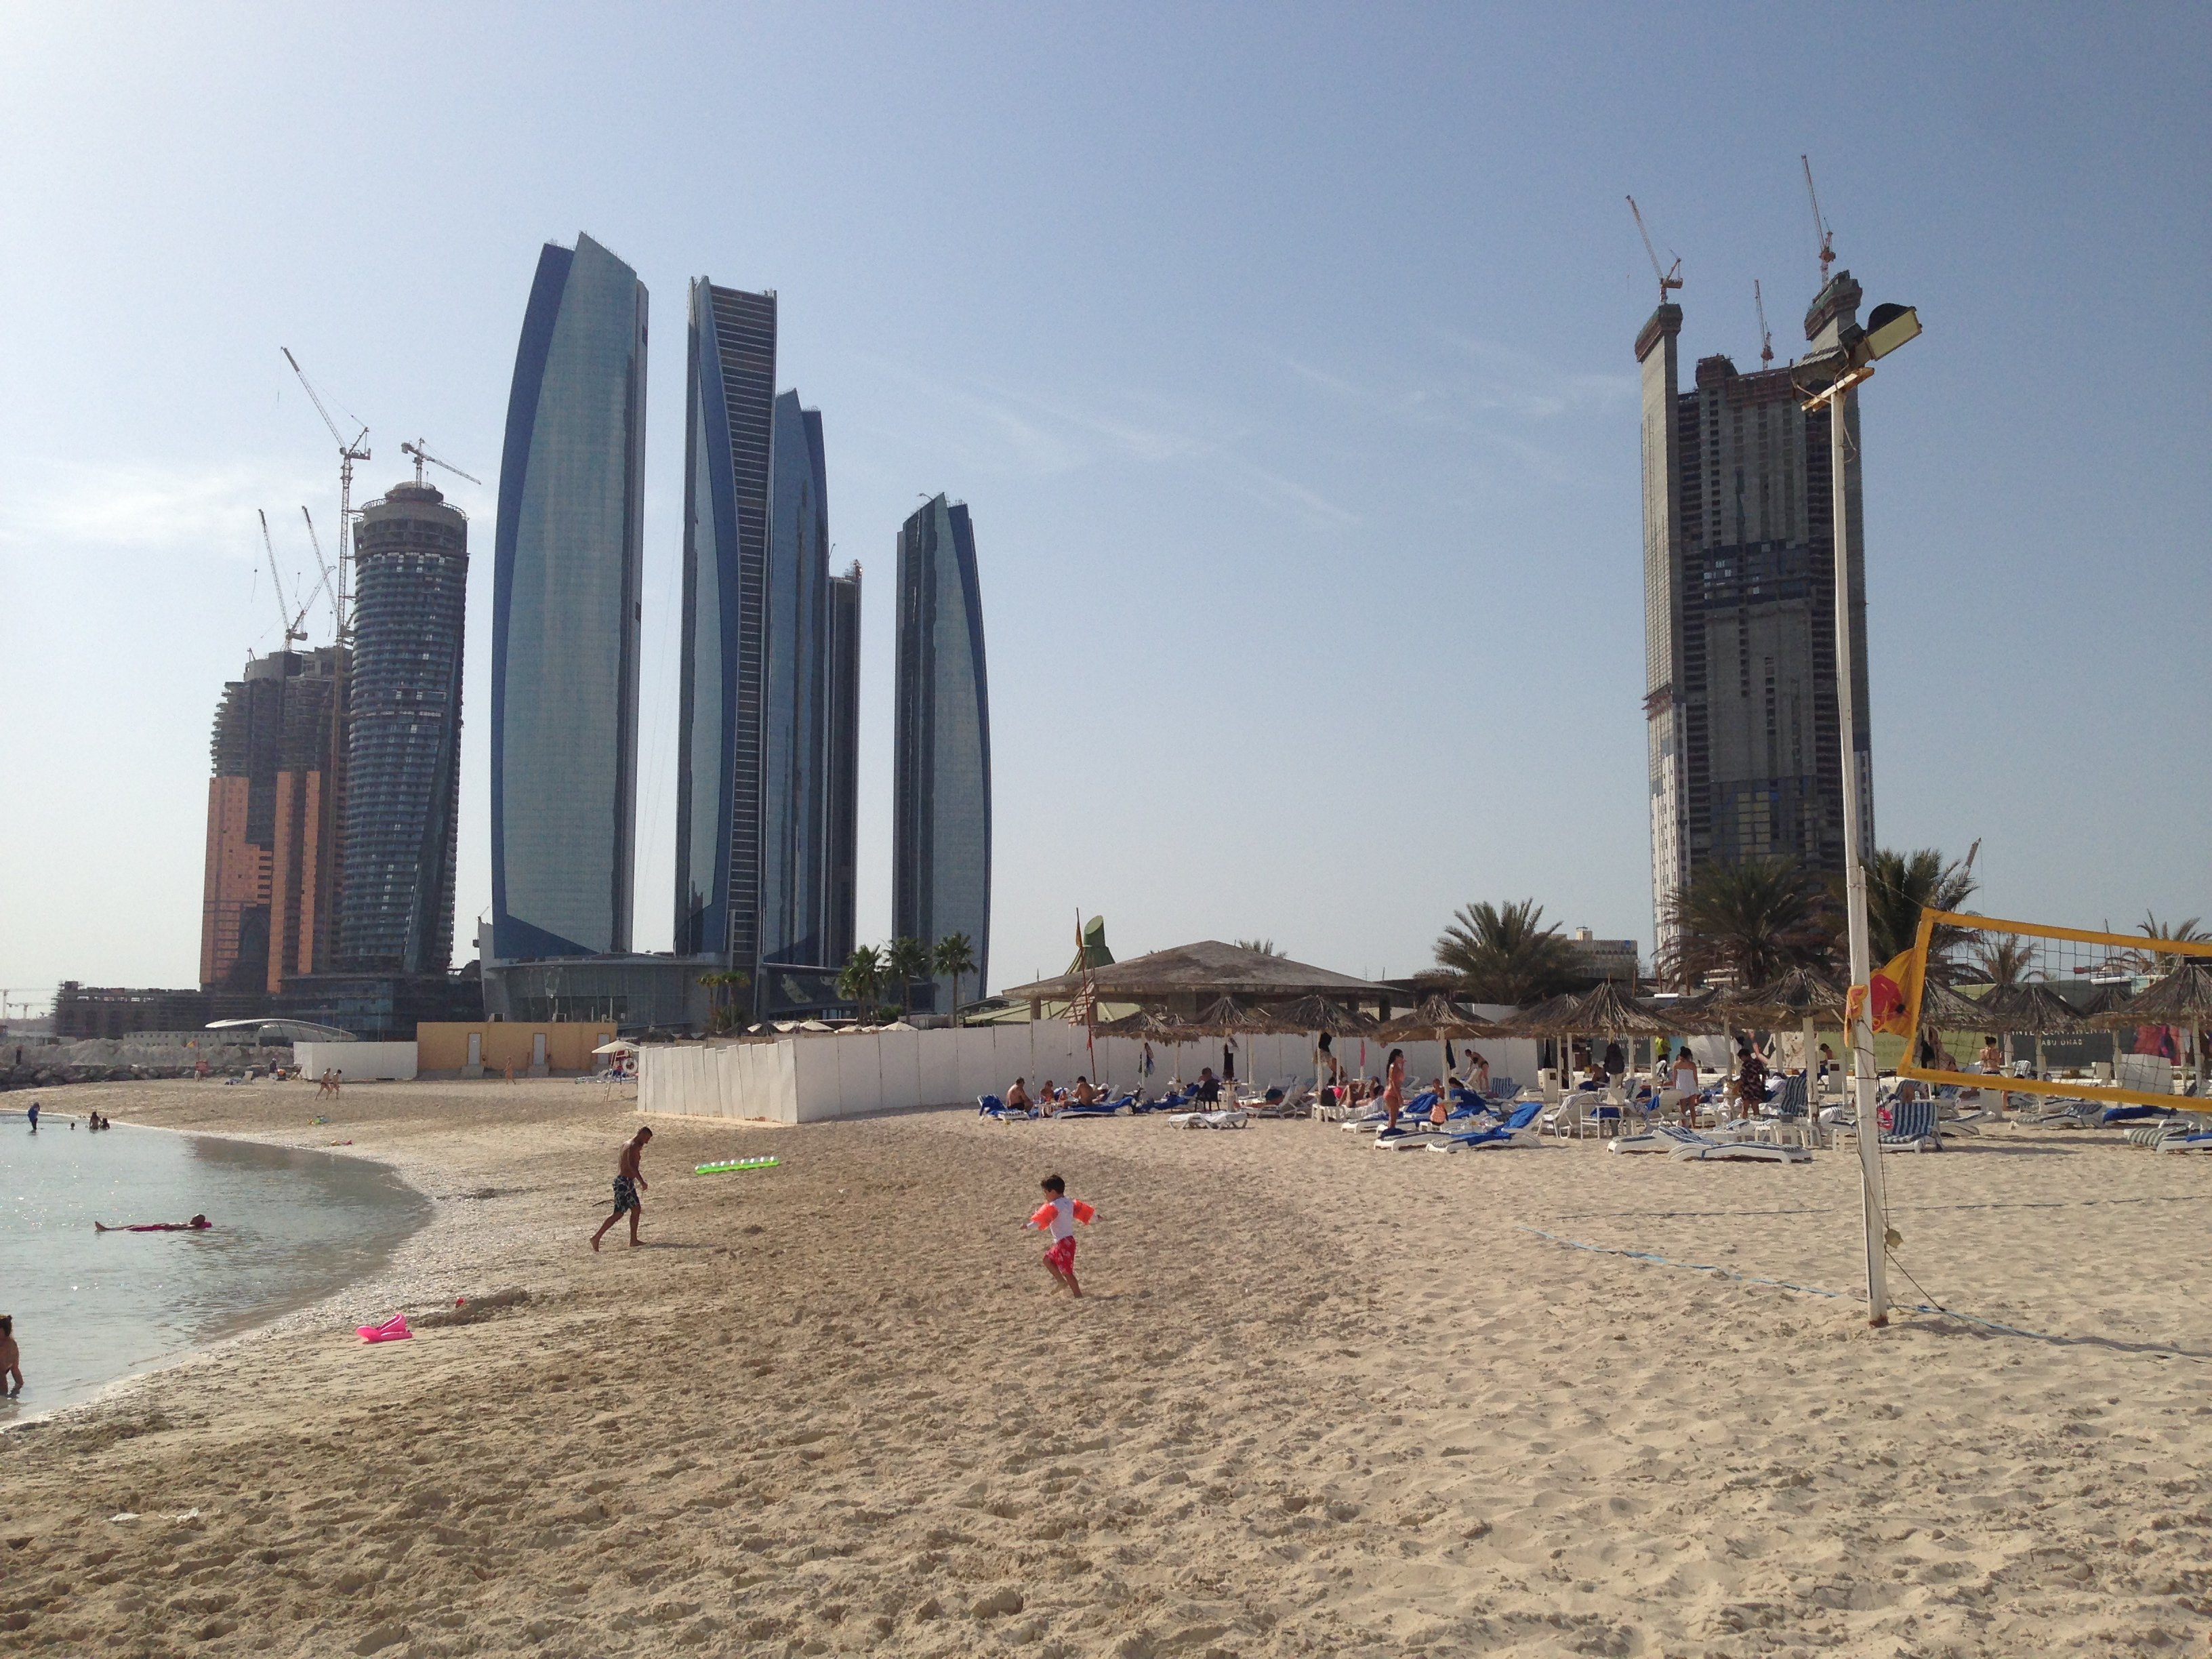 Ewige Baustelle: Abu Dhabi